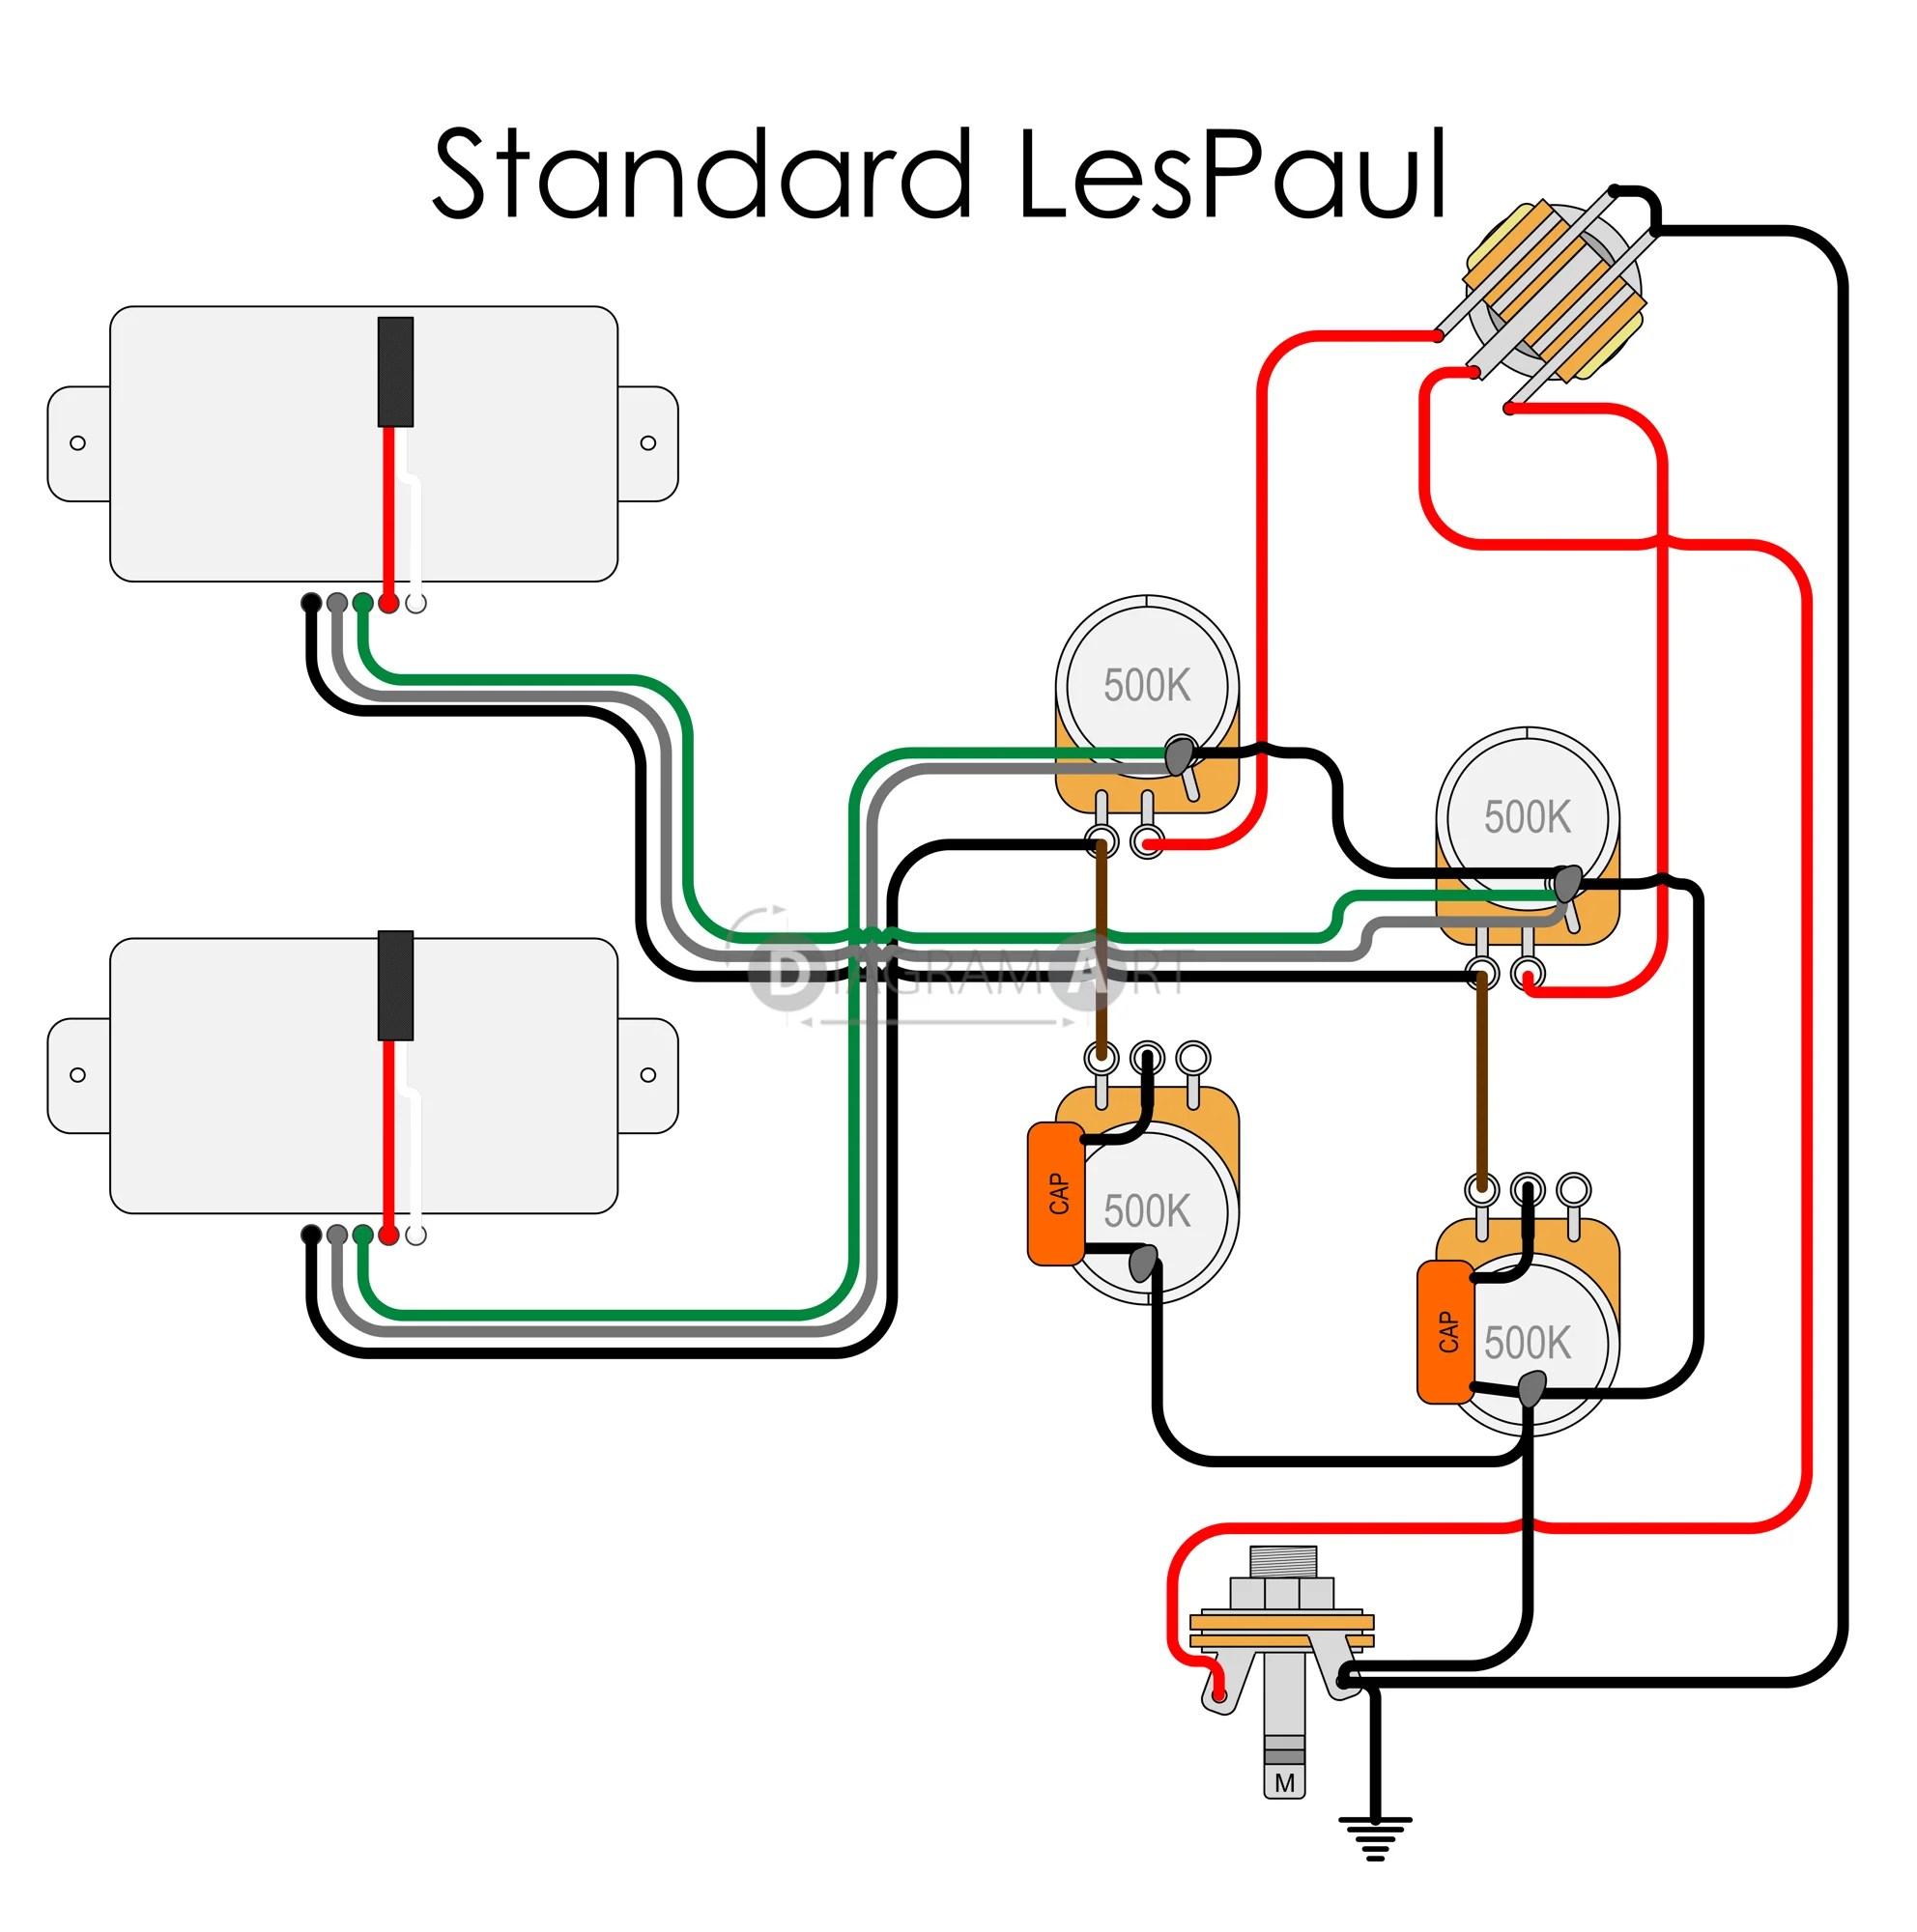 medium resolution of electric guitar wiring standard lespaul electric circuit diagramart vintage les paul wiring diagram electric